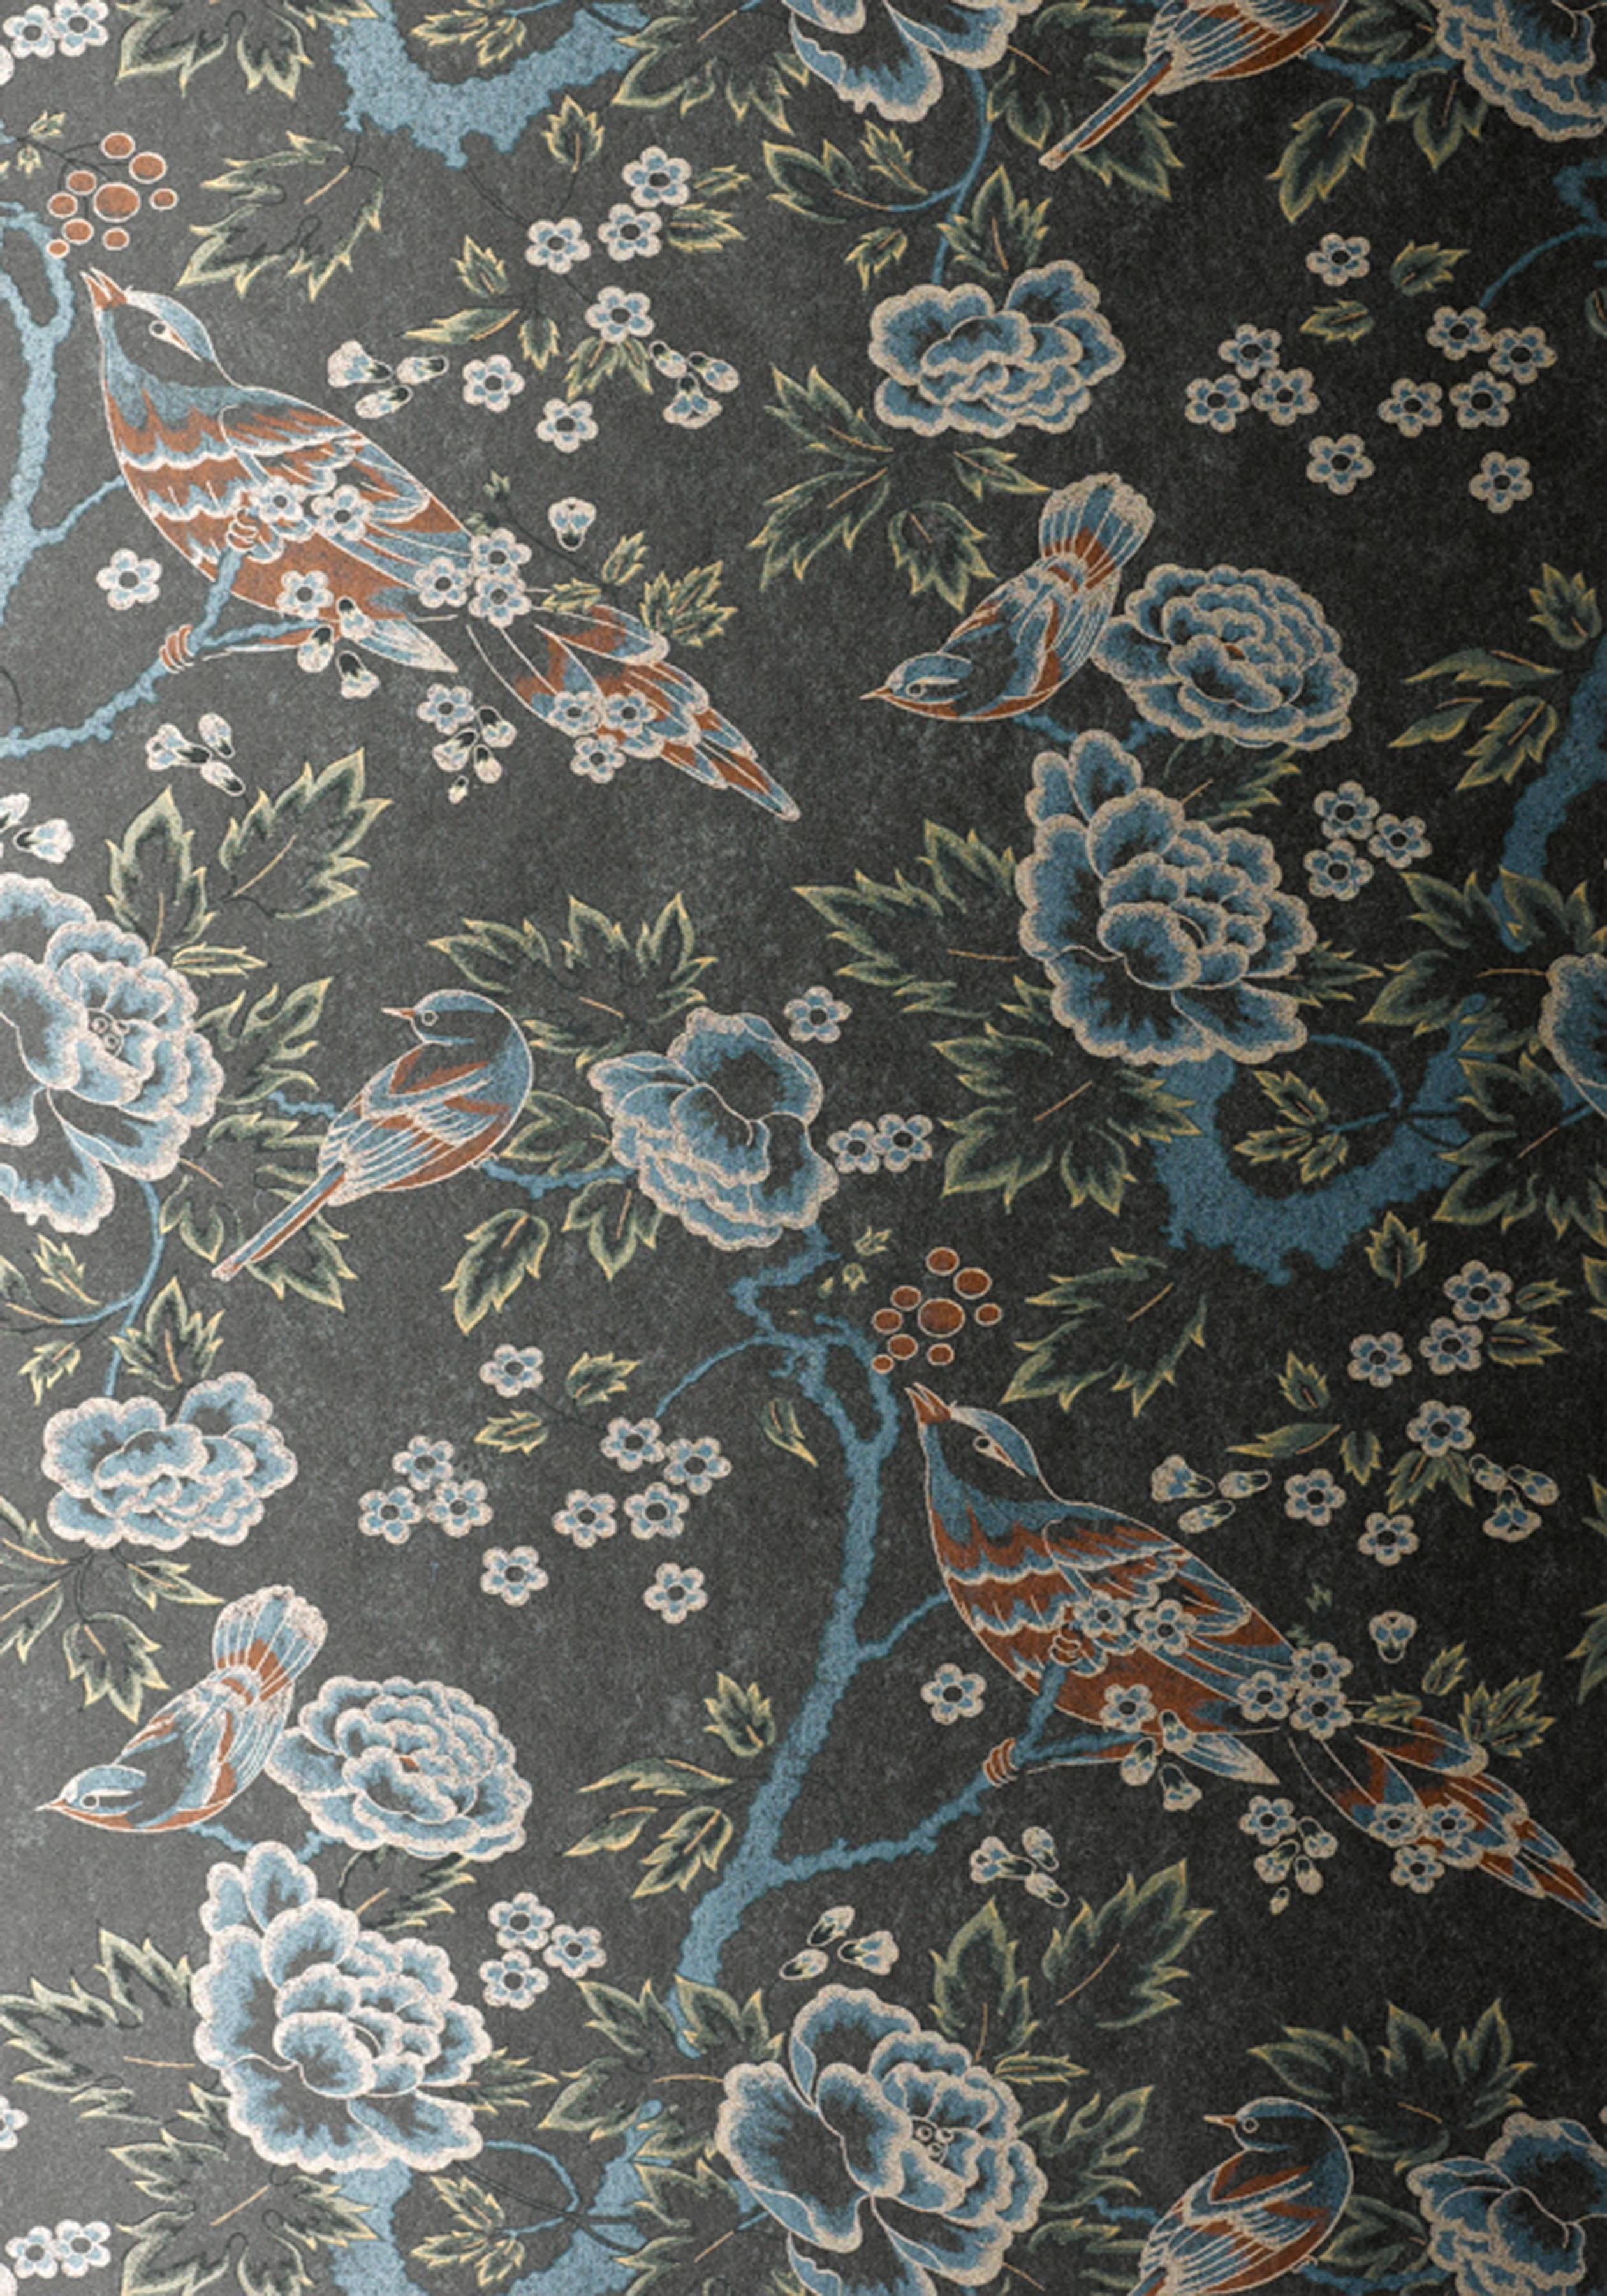 Anna-French-Wild-Flora-Songbirds-Silver-Black-shop-connection-com-wallpaper-wp4404500